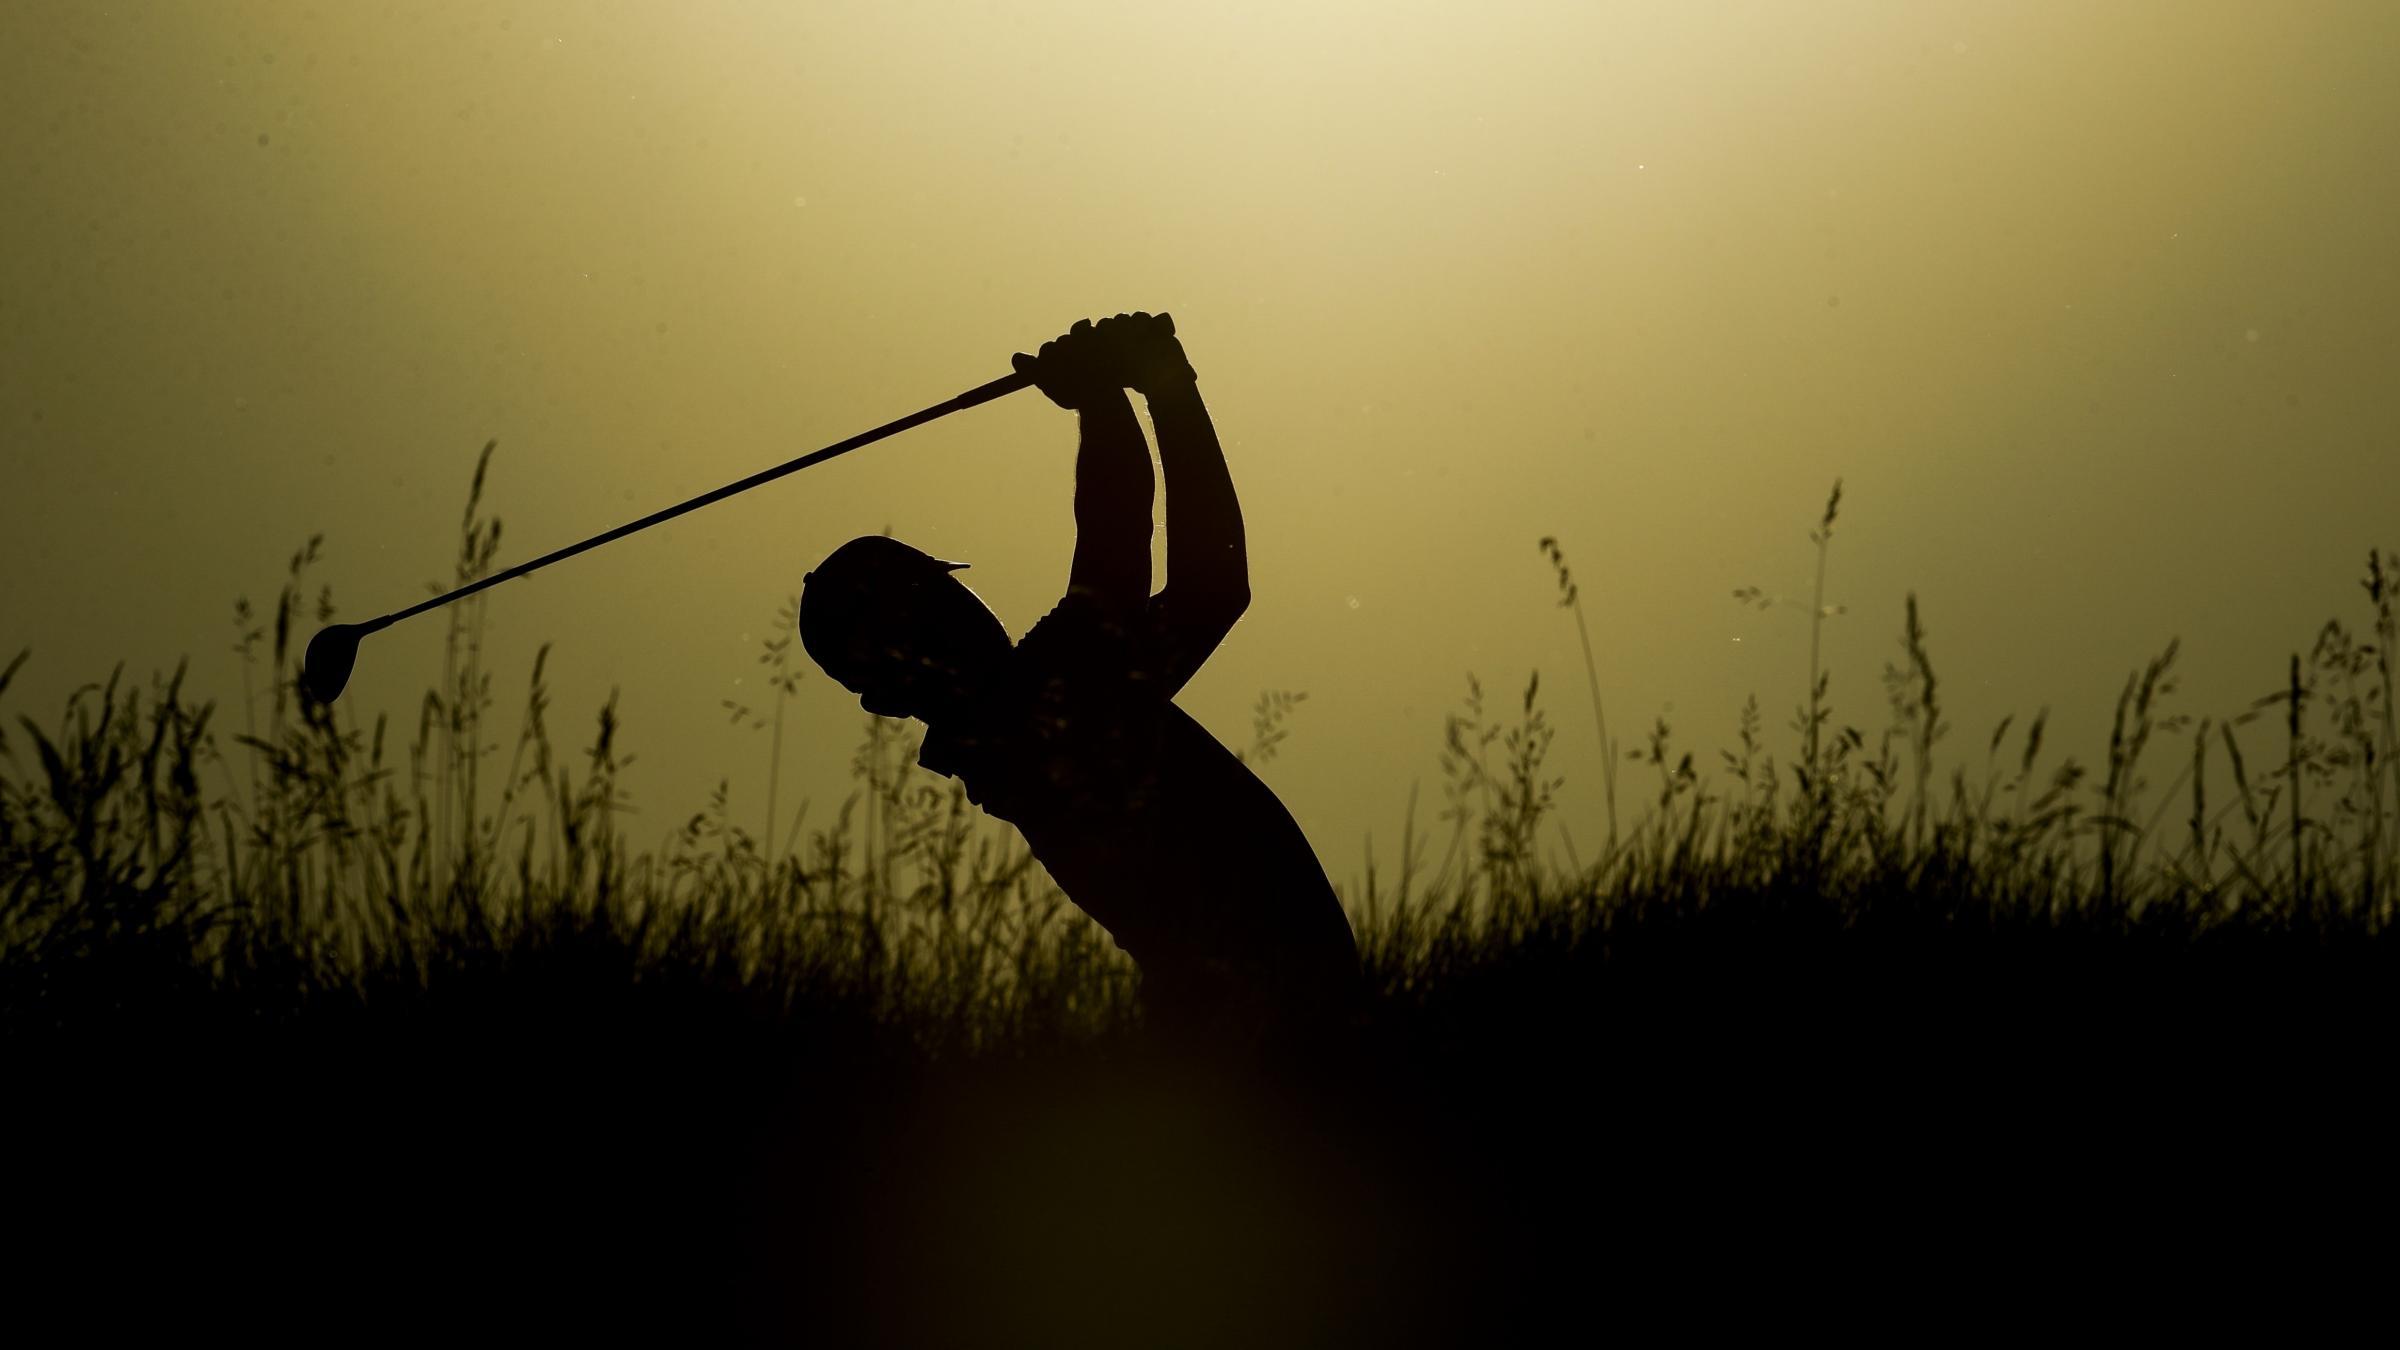 Blimp crashes at US Open golf tourney